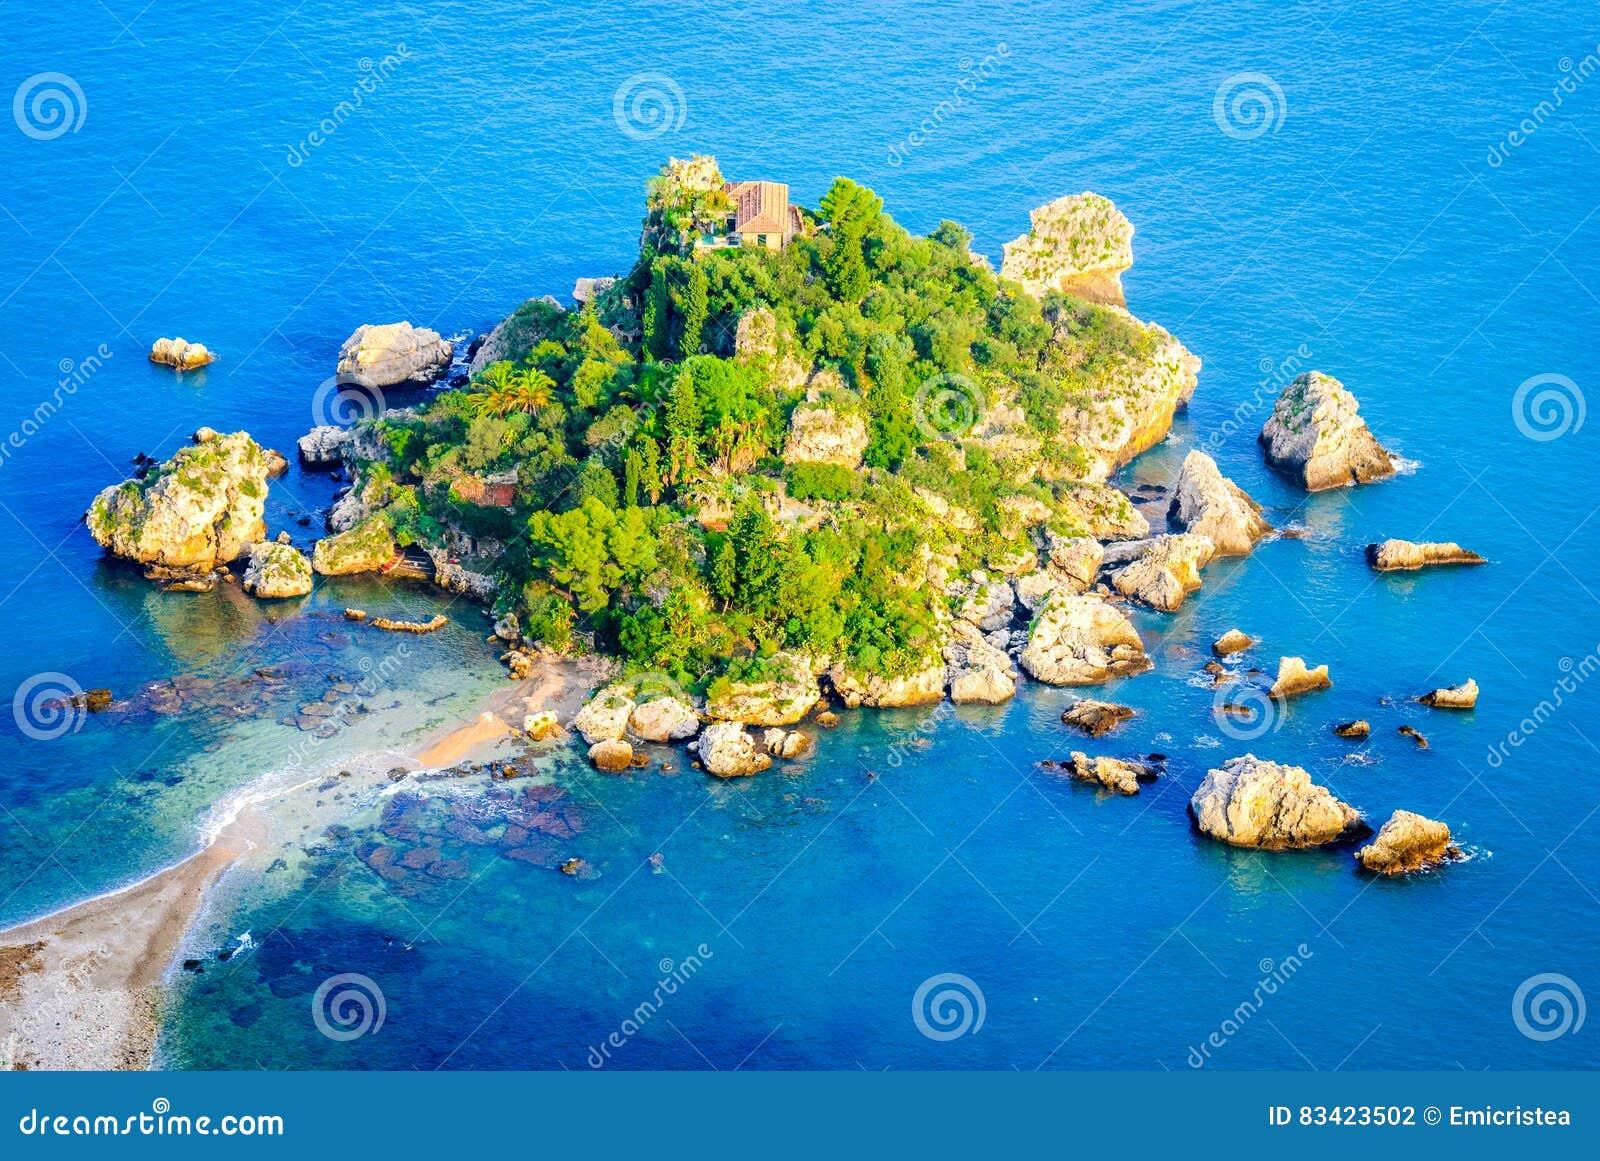 Isola Bella - Taormina, Sicilien, Italien